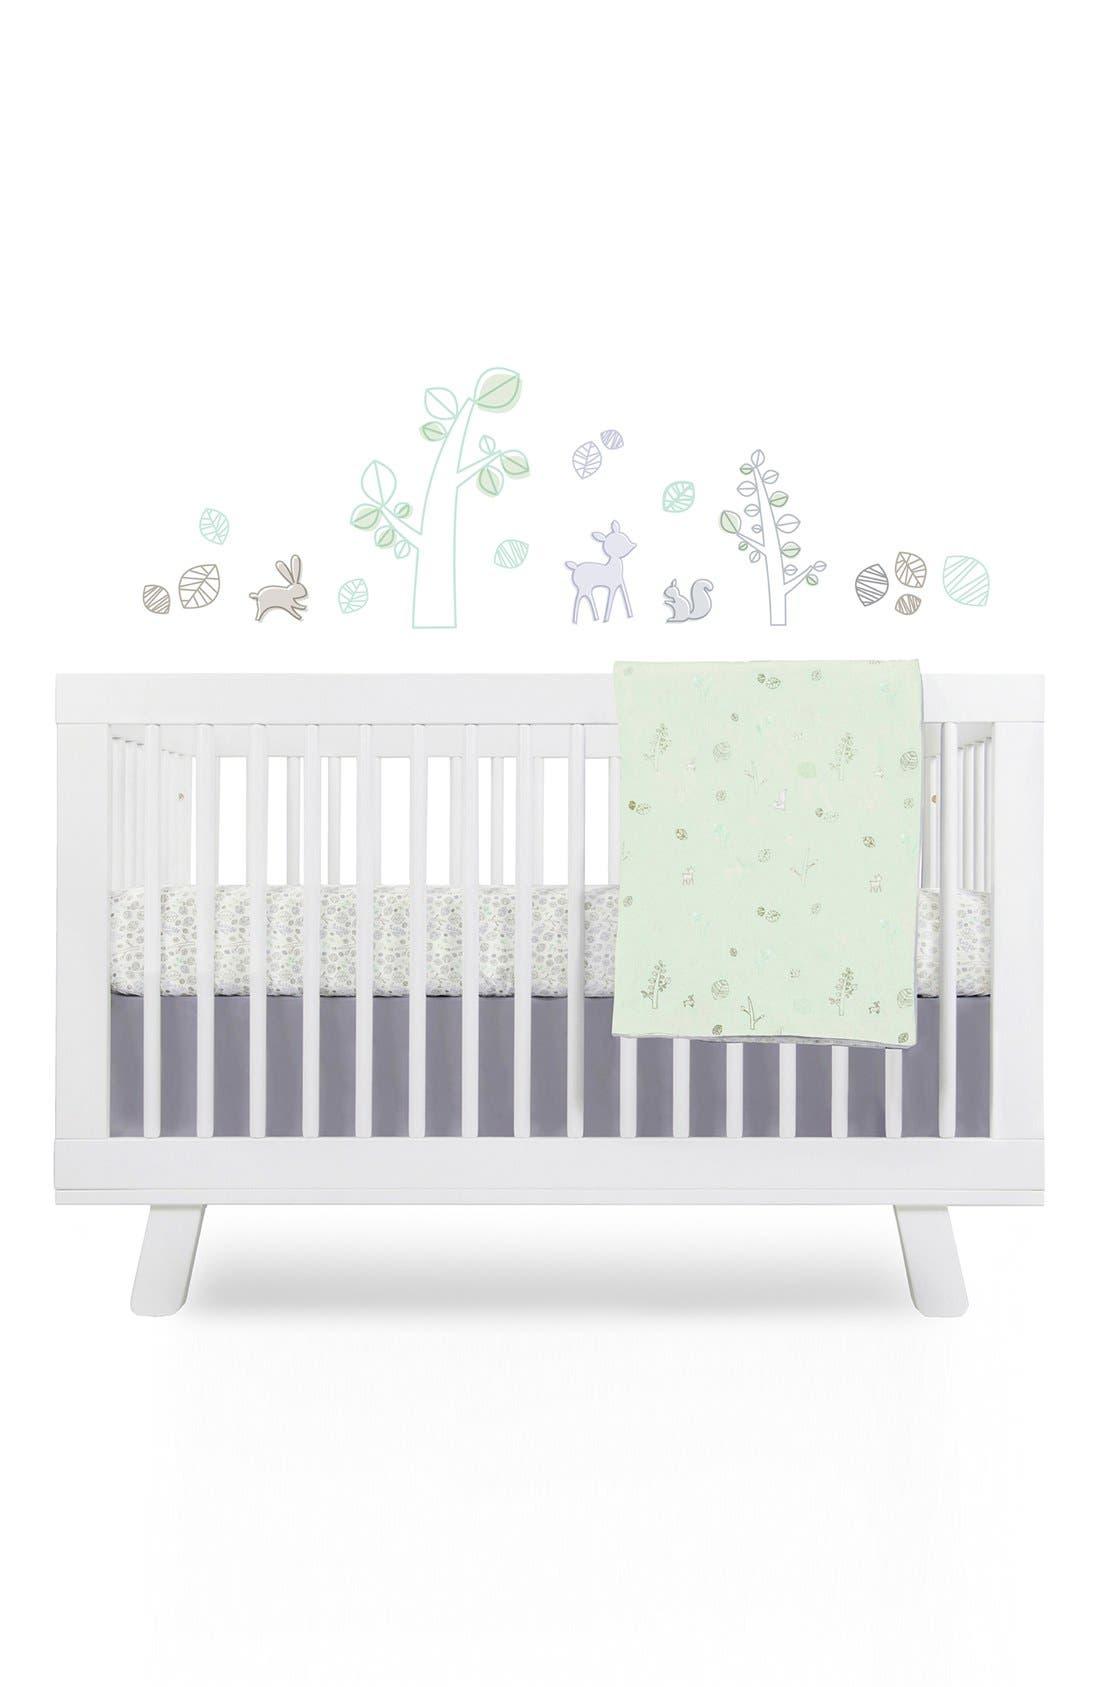 'Woods' Crib Sheet, Crib Skirt, Contour Changing Pad, Play Blanket & Wall Decals,                             Main thumbnail 1, color,                             Green